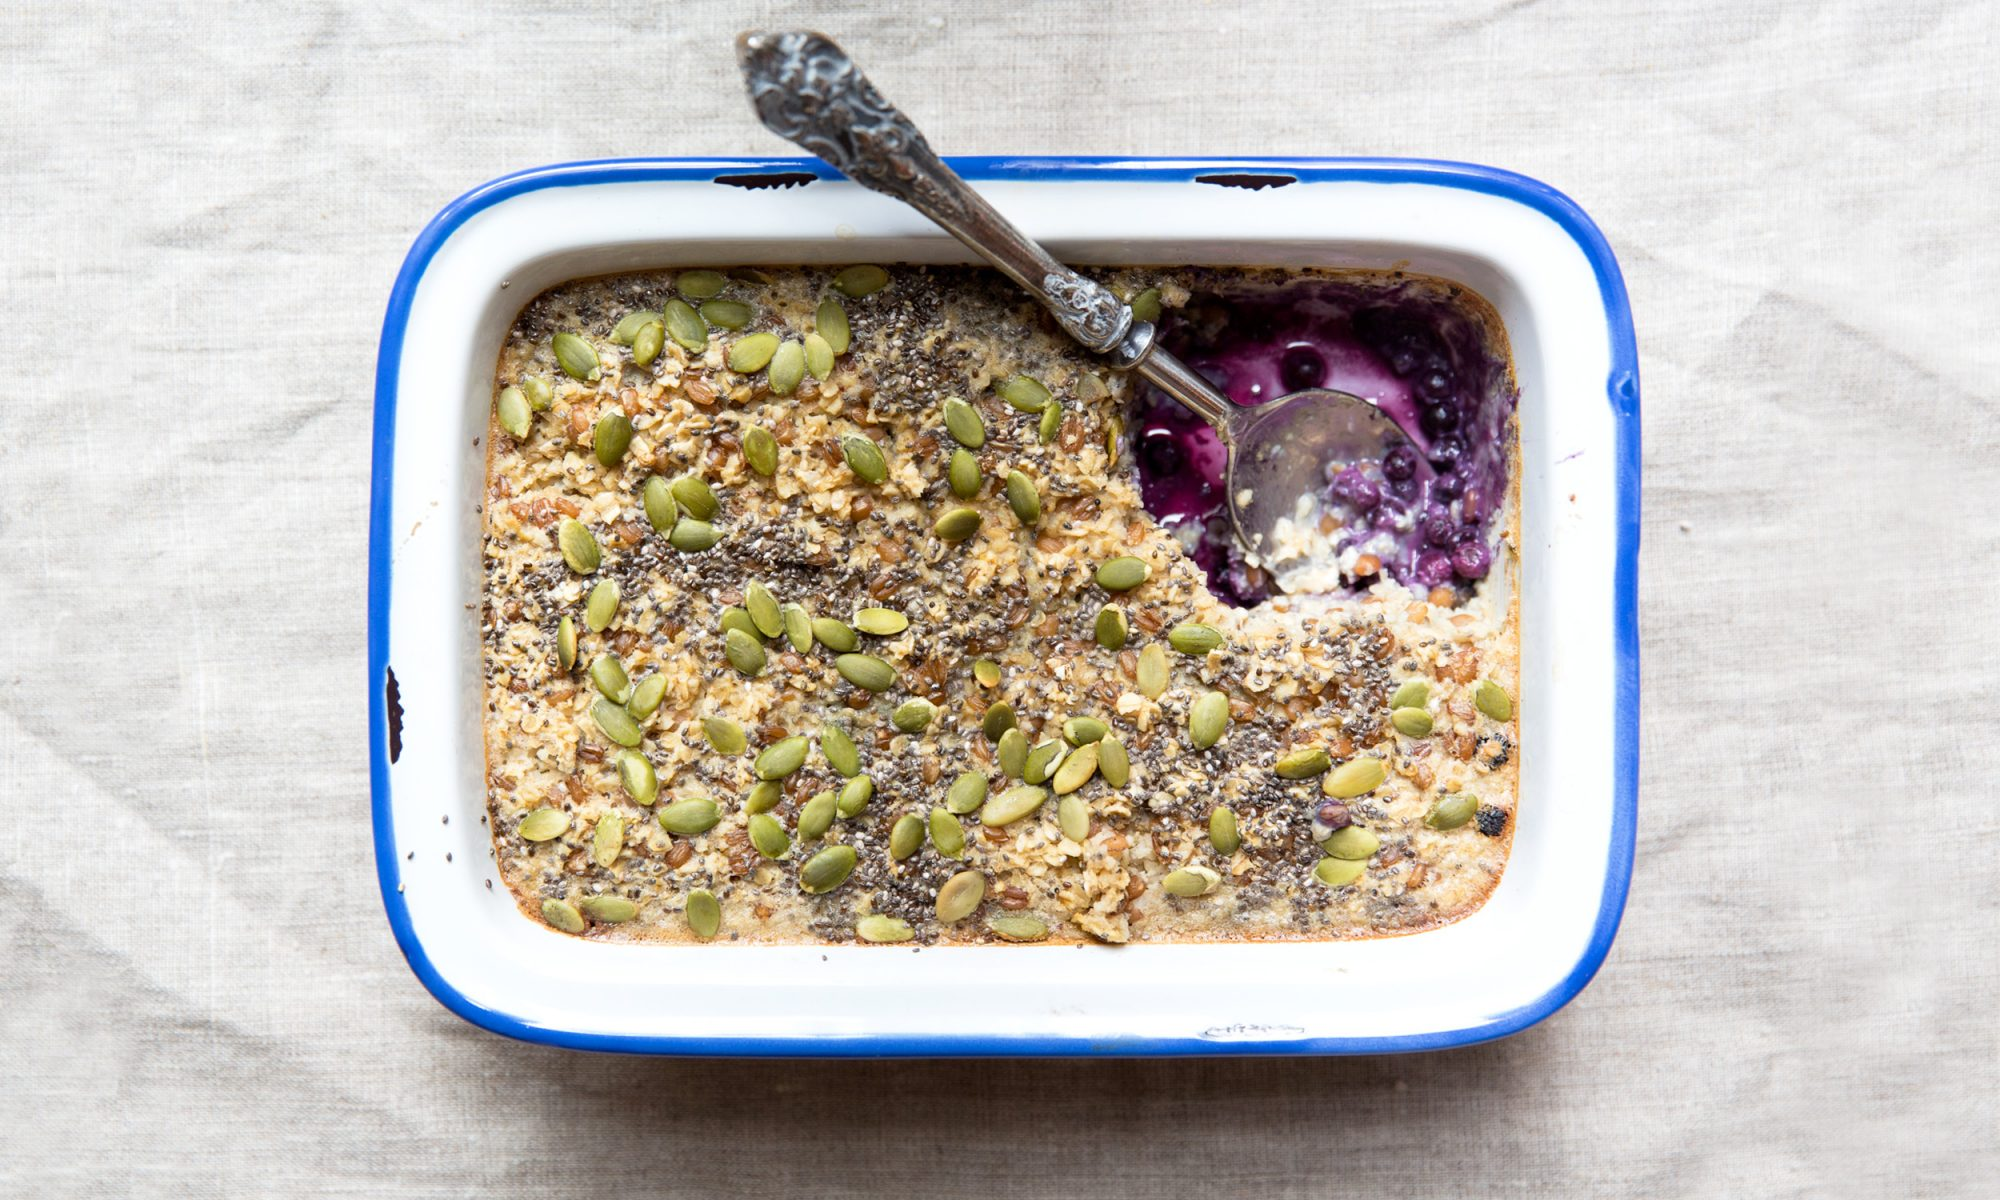 EC: 7 Baked Oatmeal Recipes That Make Meal Prep a Breeze